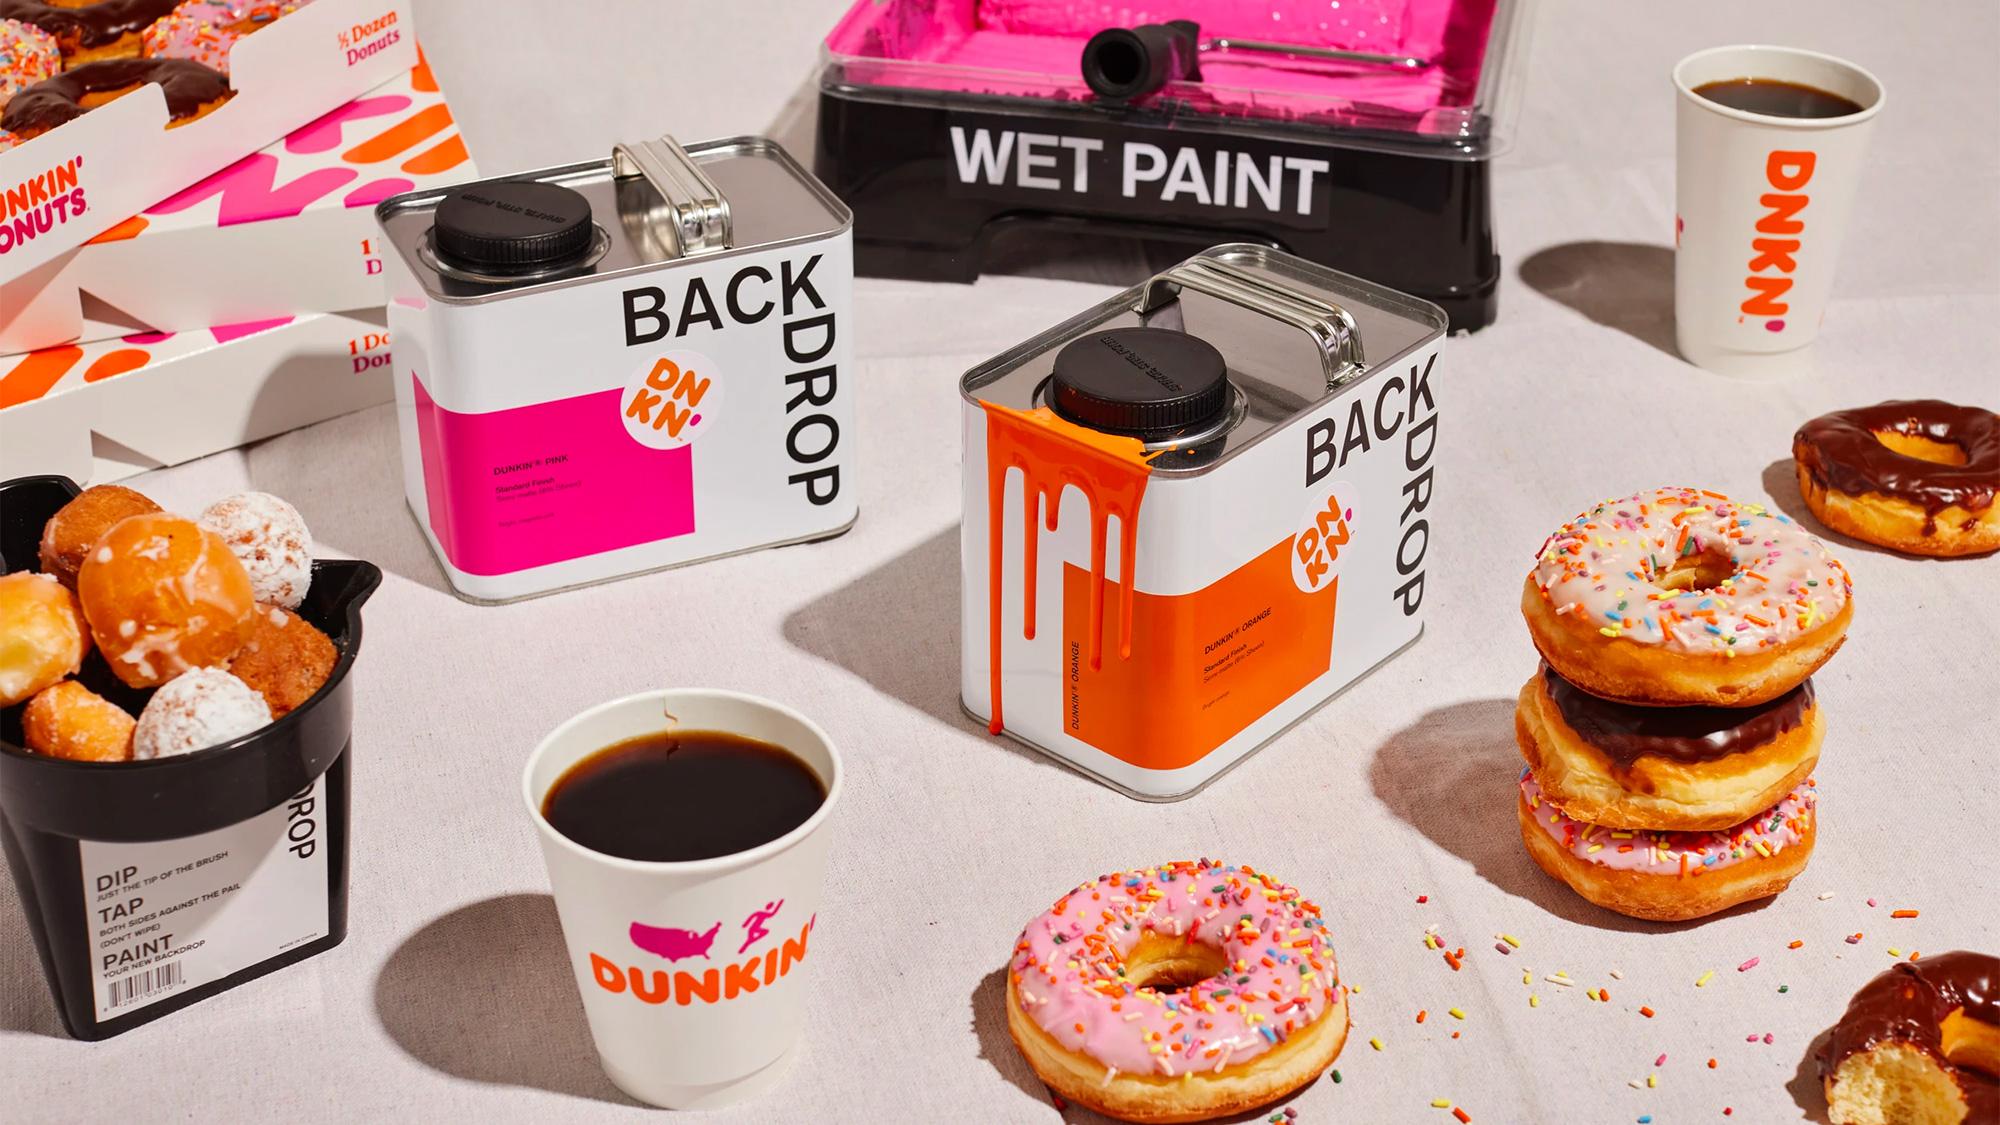 Your Room Runs on Dunkin'